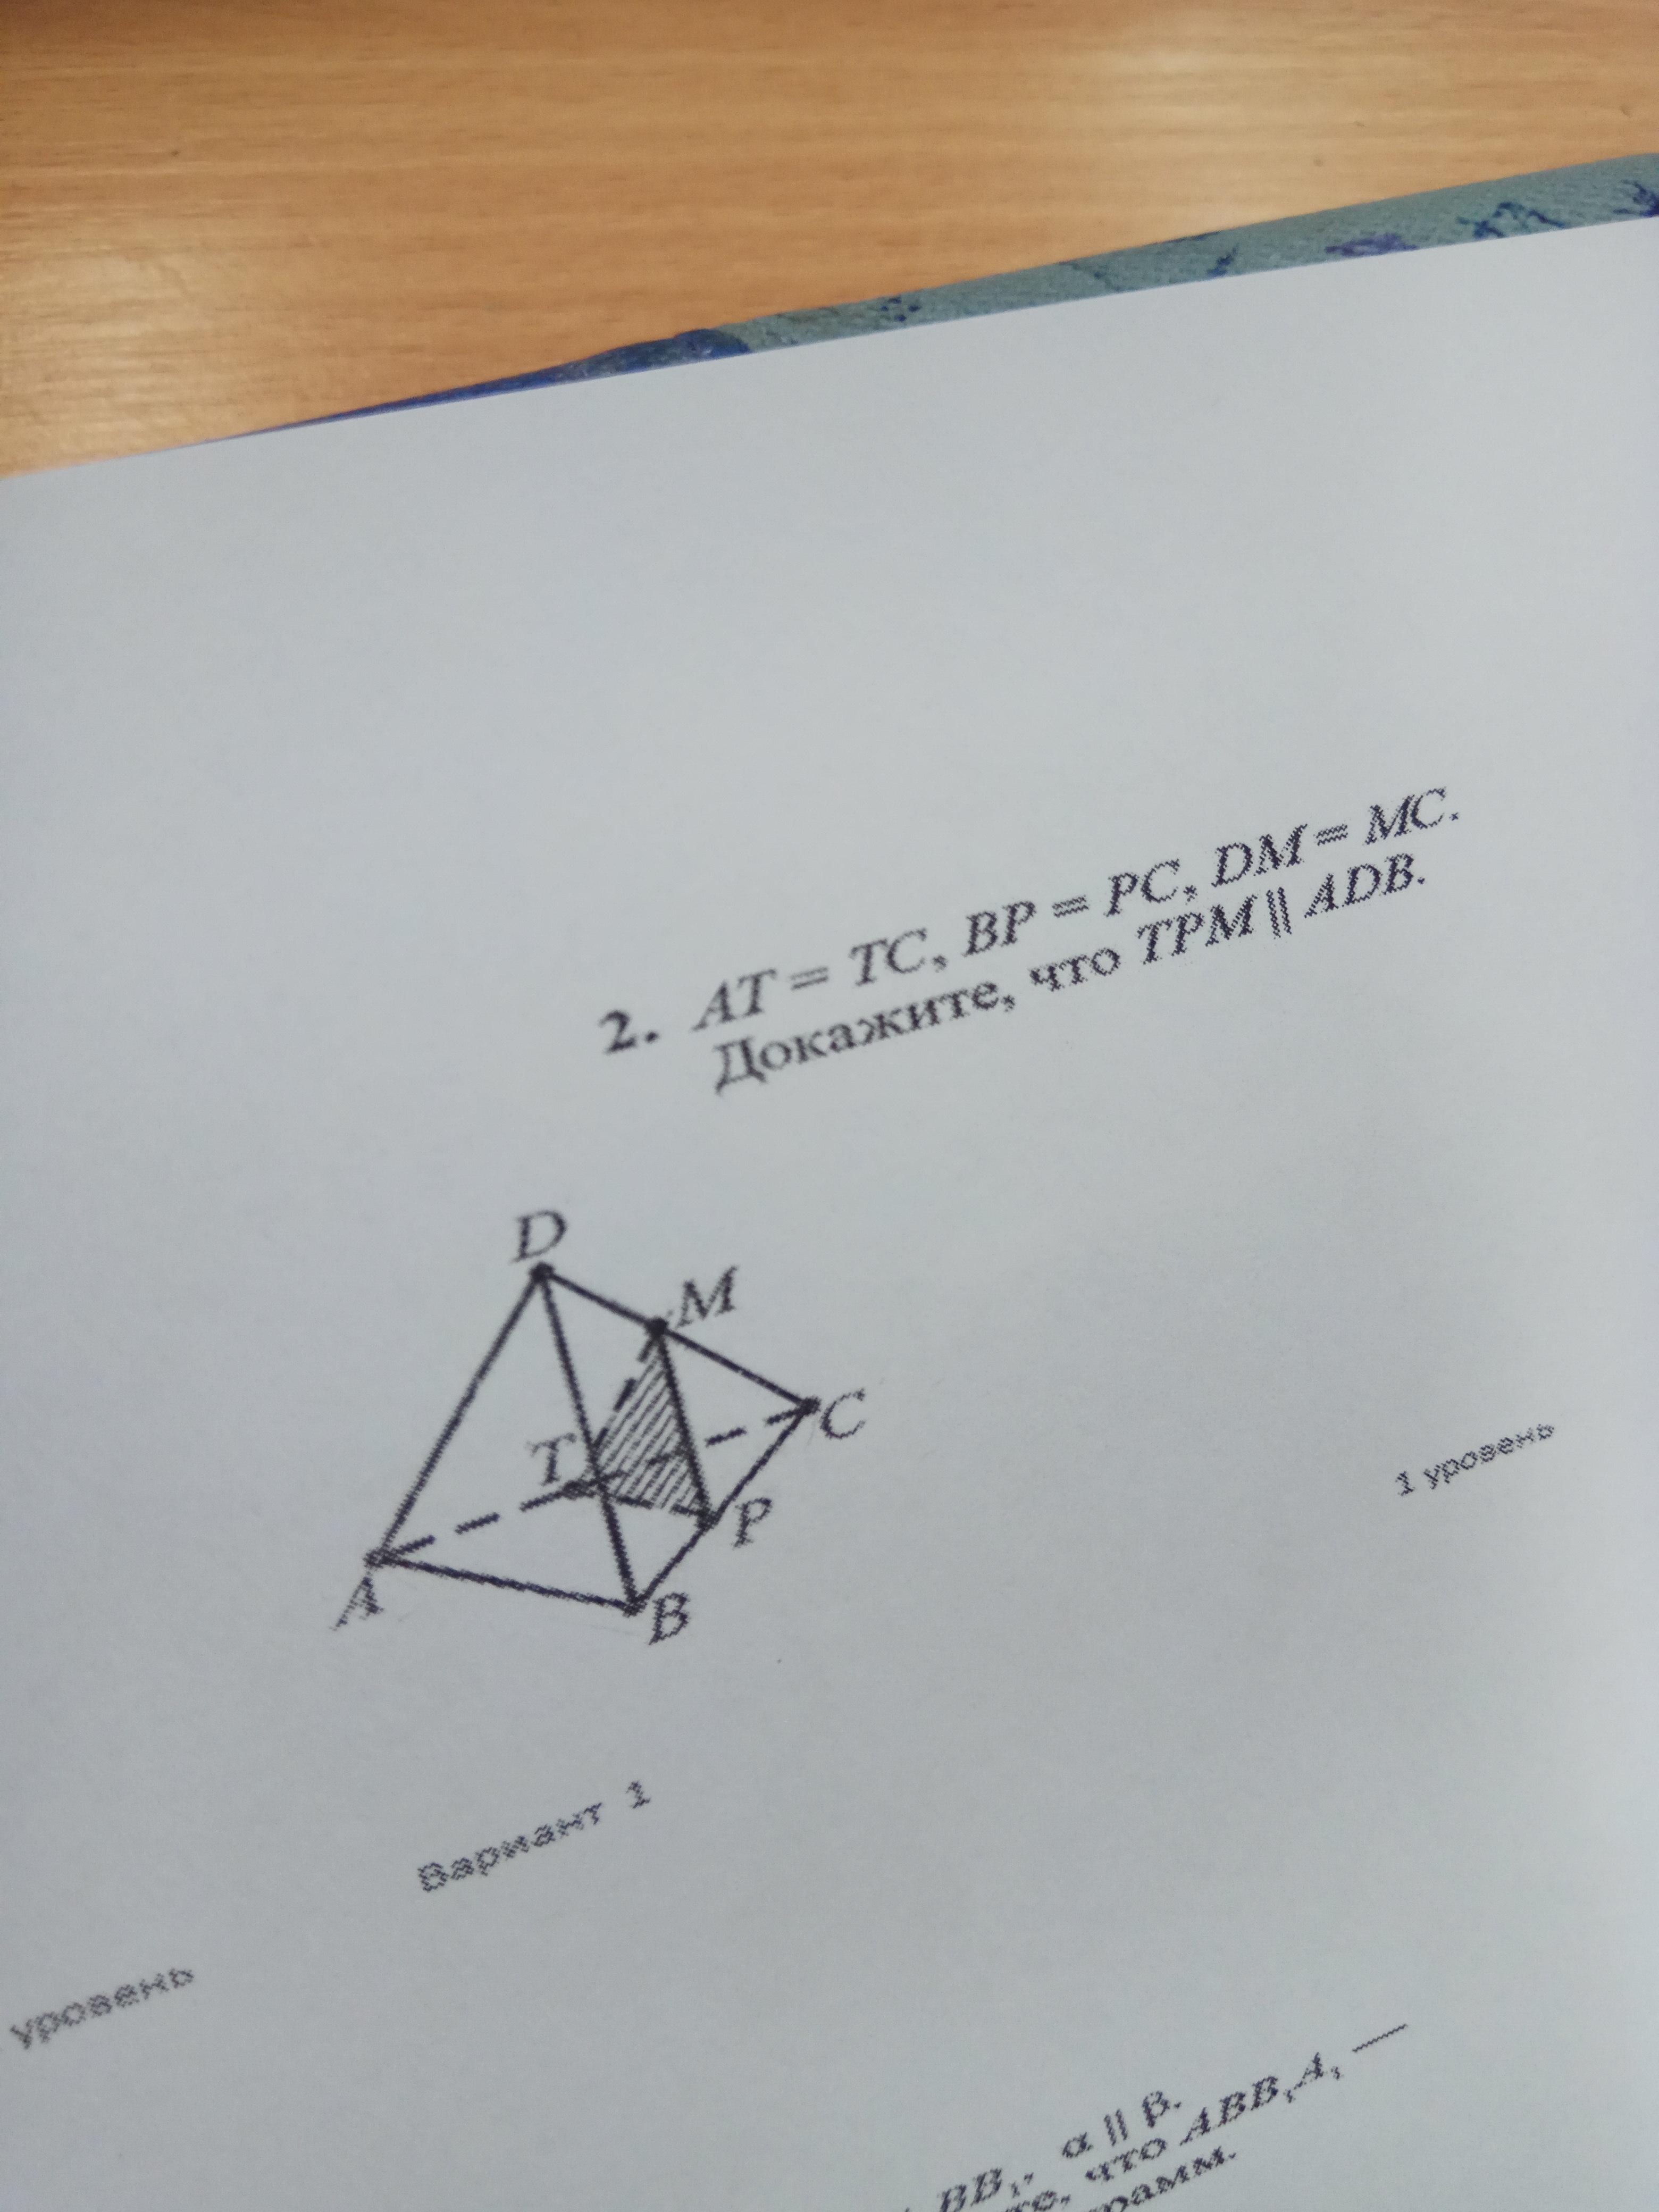 at=tc,bp=tc,dm=mc докажите что tpm параллельно adb